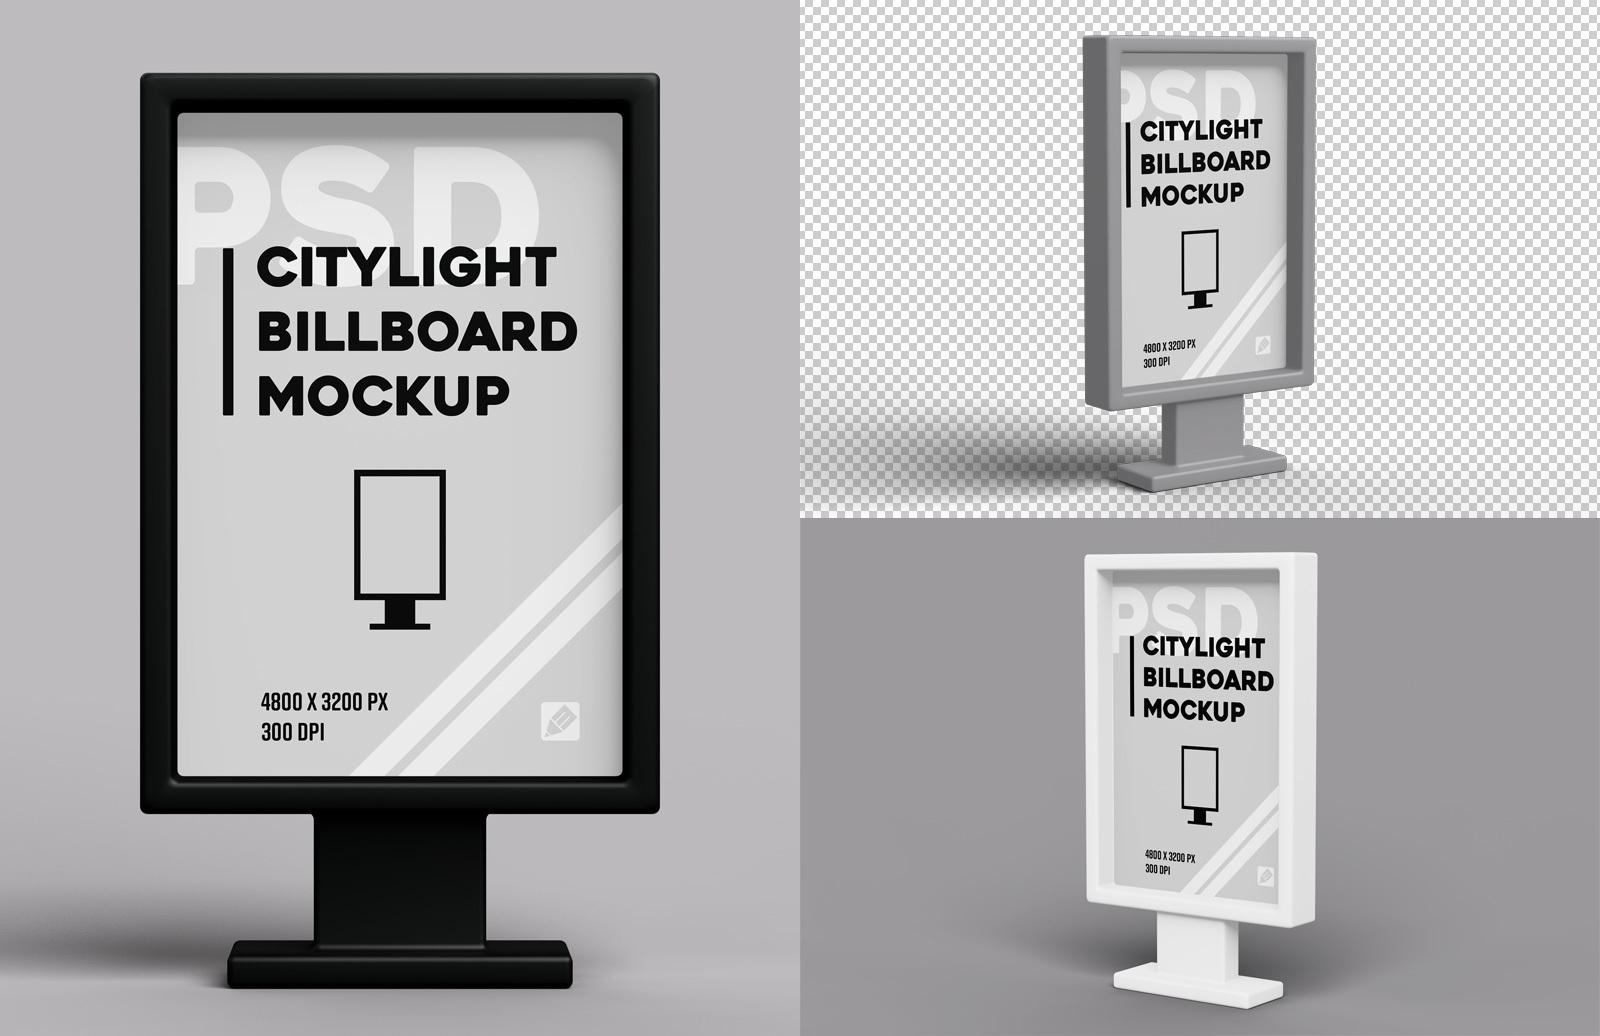 Citylight Billboard Mockup Preview 1